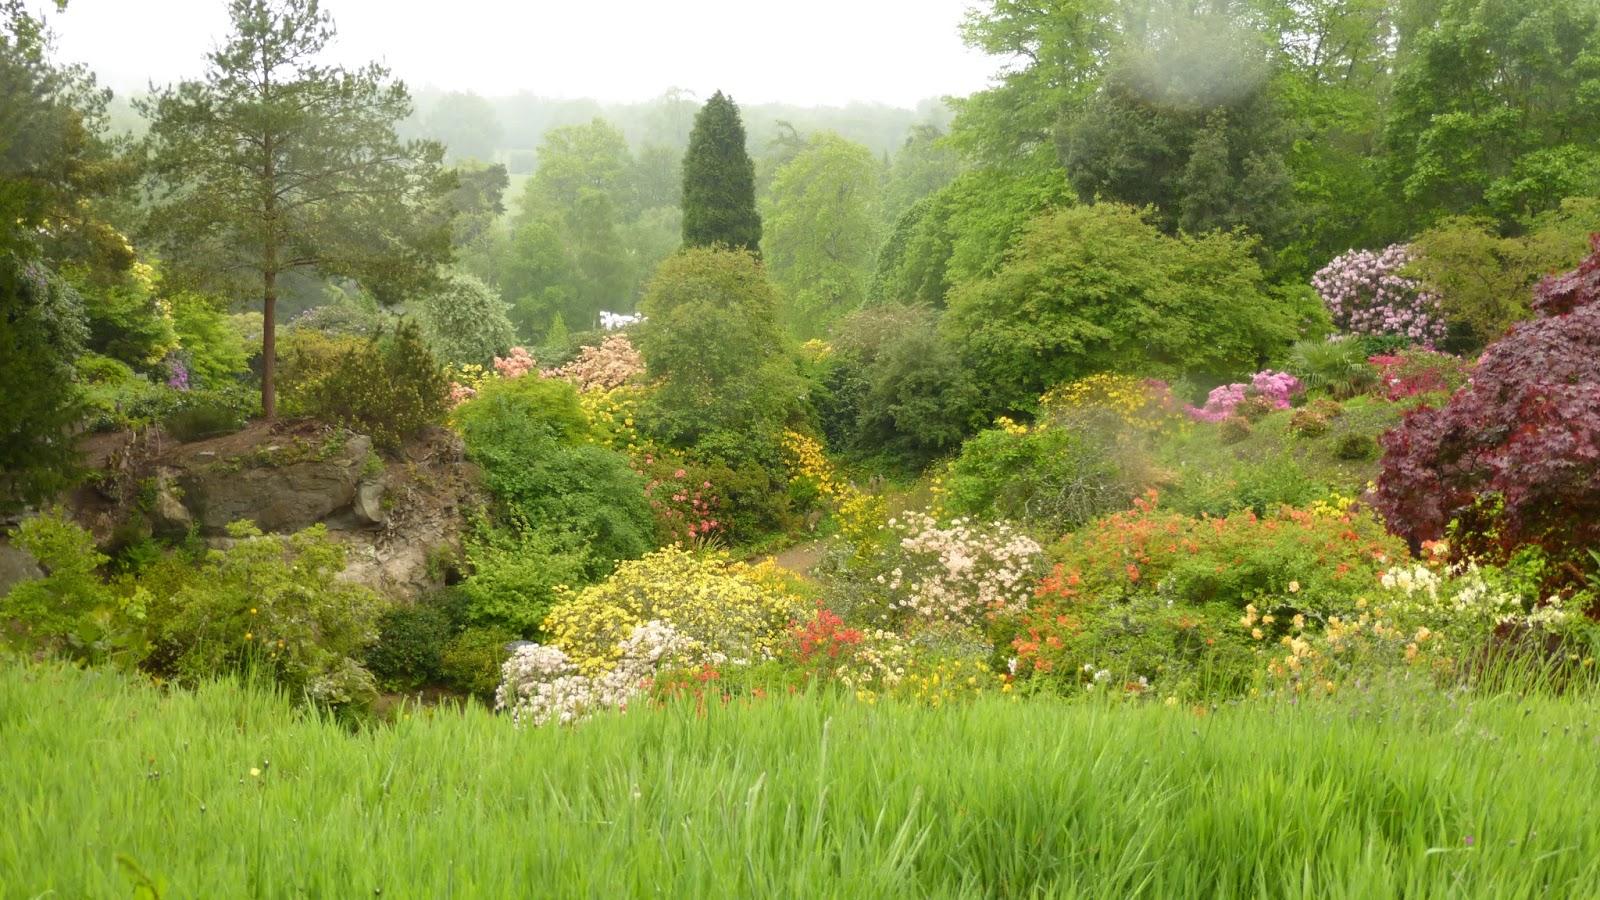 Mon jardin entre terre et mer last but not least scotney castle - Terre de bruyere ...